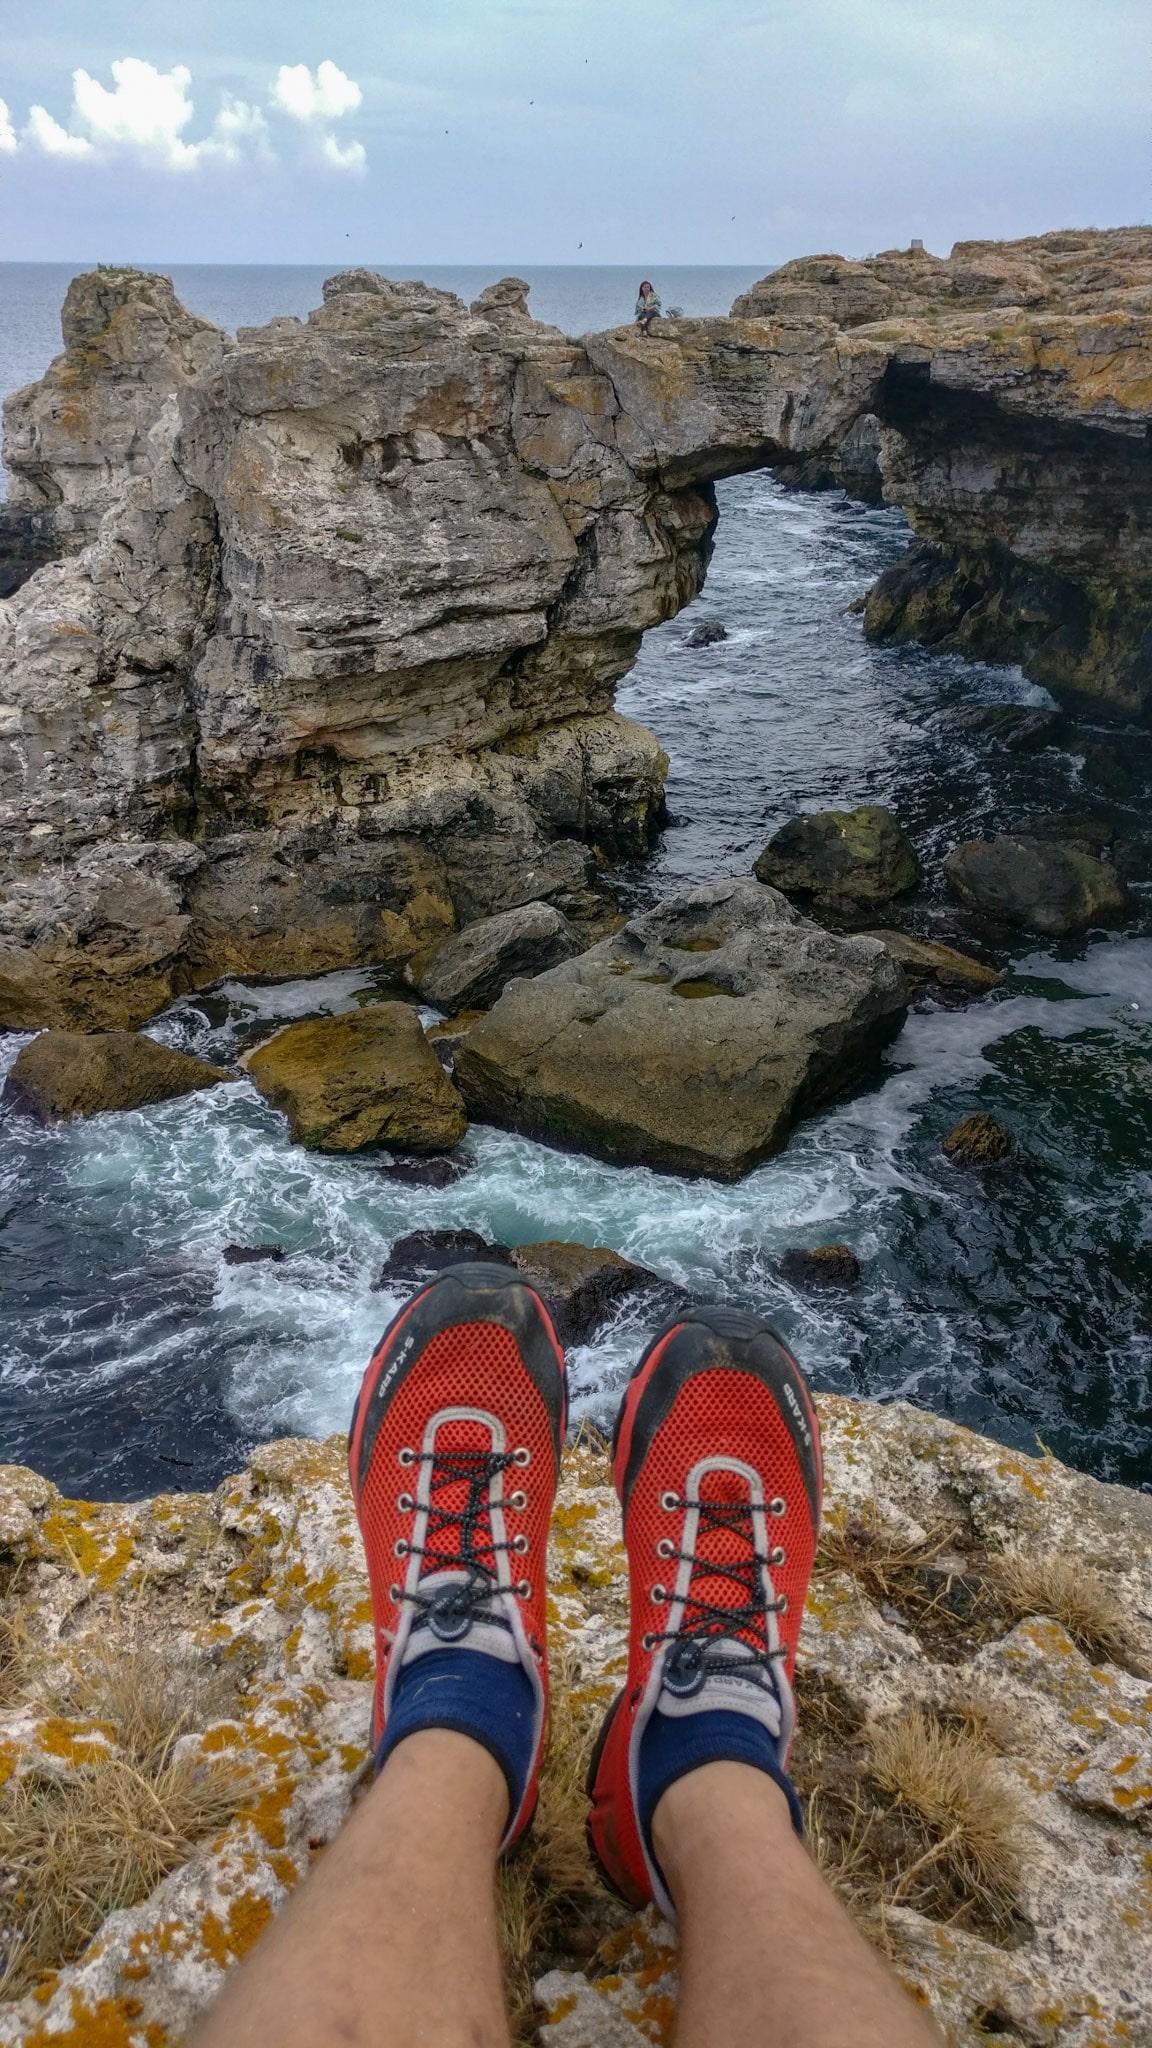 S-Karp on the rocks